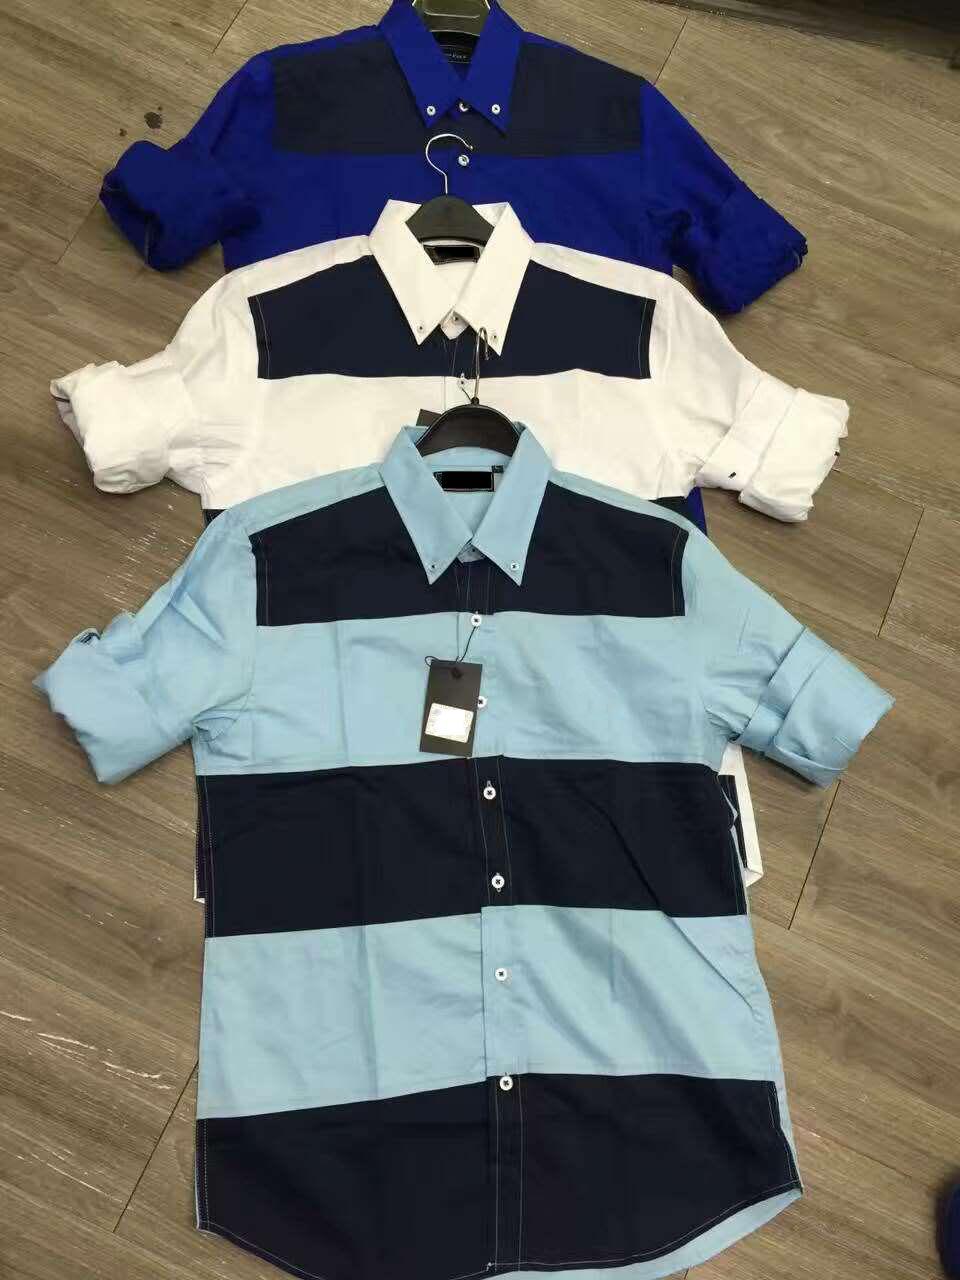 Shirt design for mens -  2017 New Autumn Shirts Short Tee Casual Custom Online Men Shirt Design Colour Mens Print Patchwork